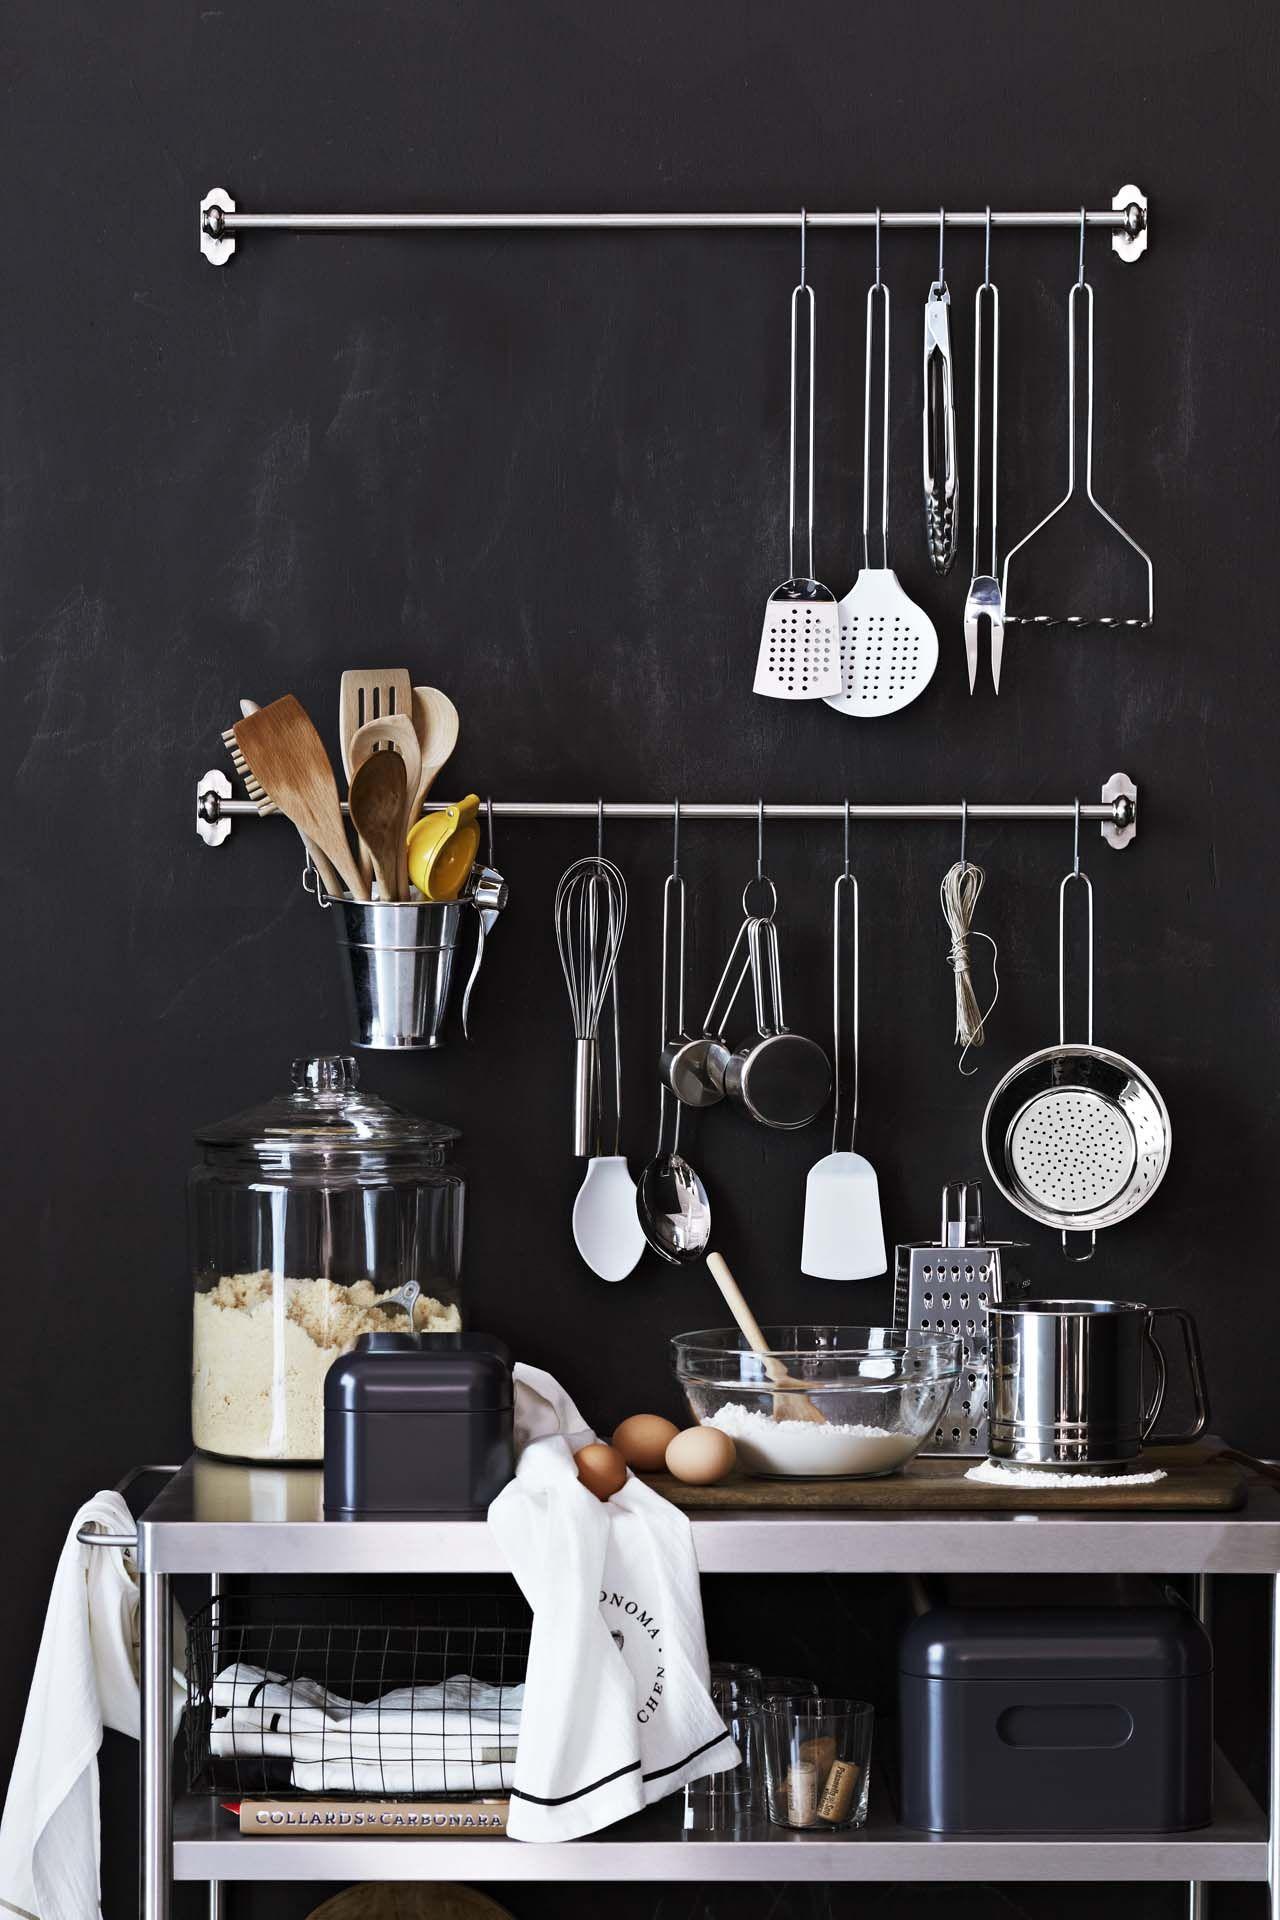 Introducing Williams Sonoma Open Kitchen Open Kitchen Kitchen Tools Organization Kitchen Inspirations